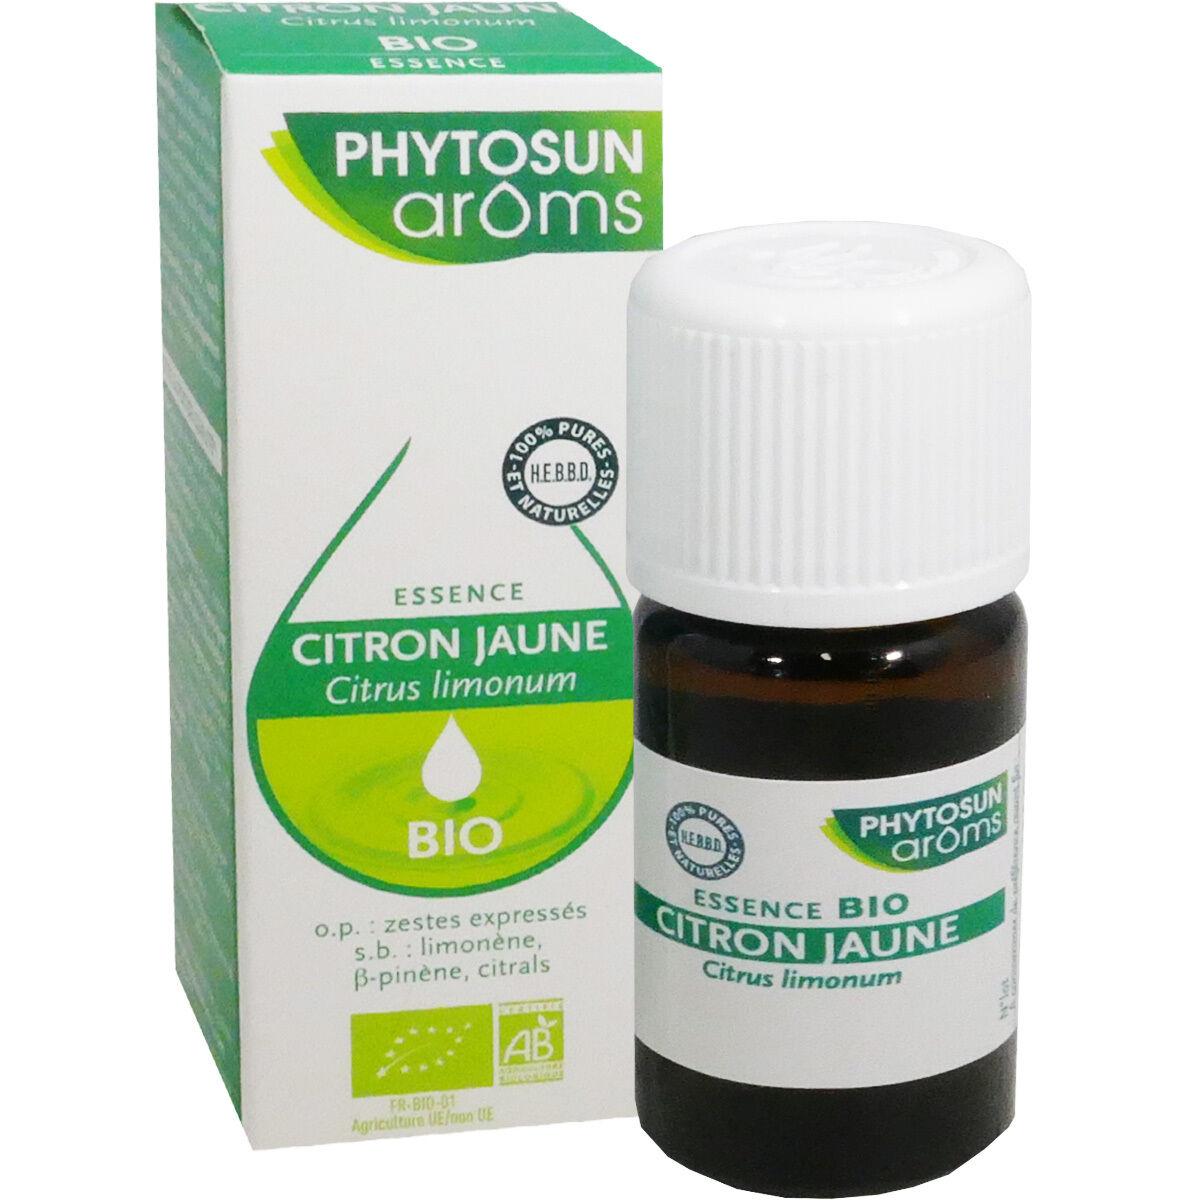 Phytosun aroms huile essentielle citron jaune 10 ml